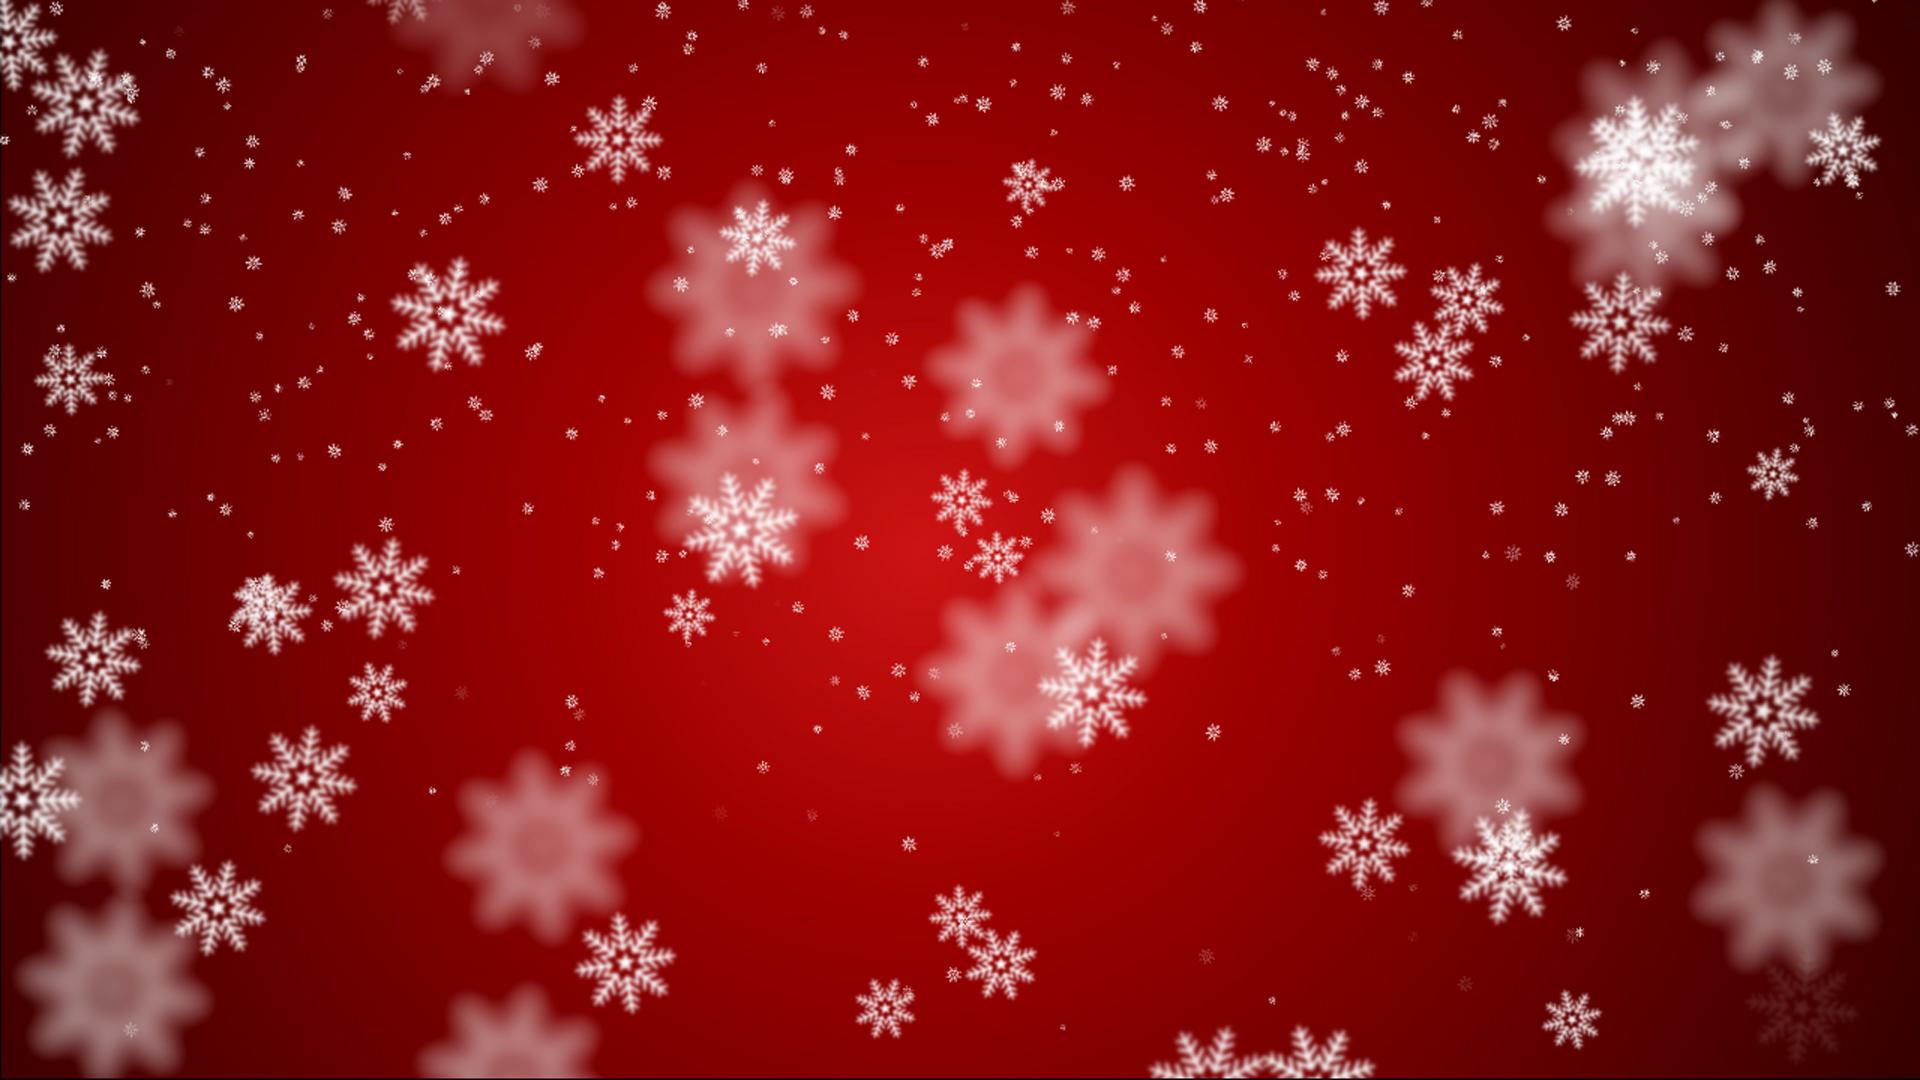 est100 some photos Christmas christmas card 1920x1080